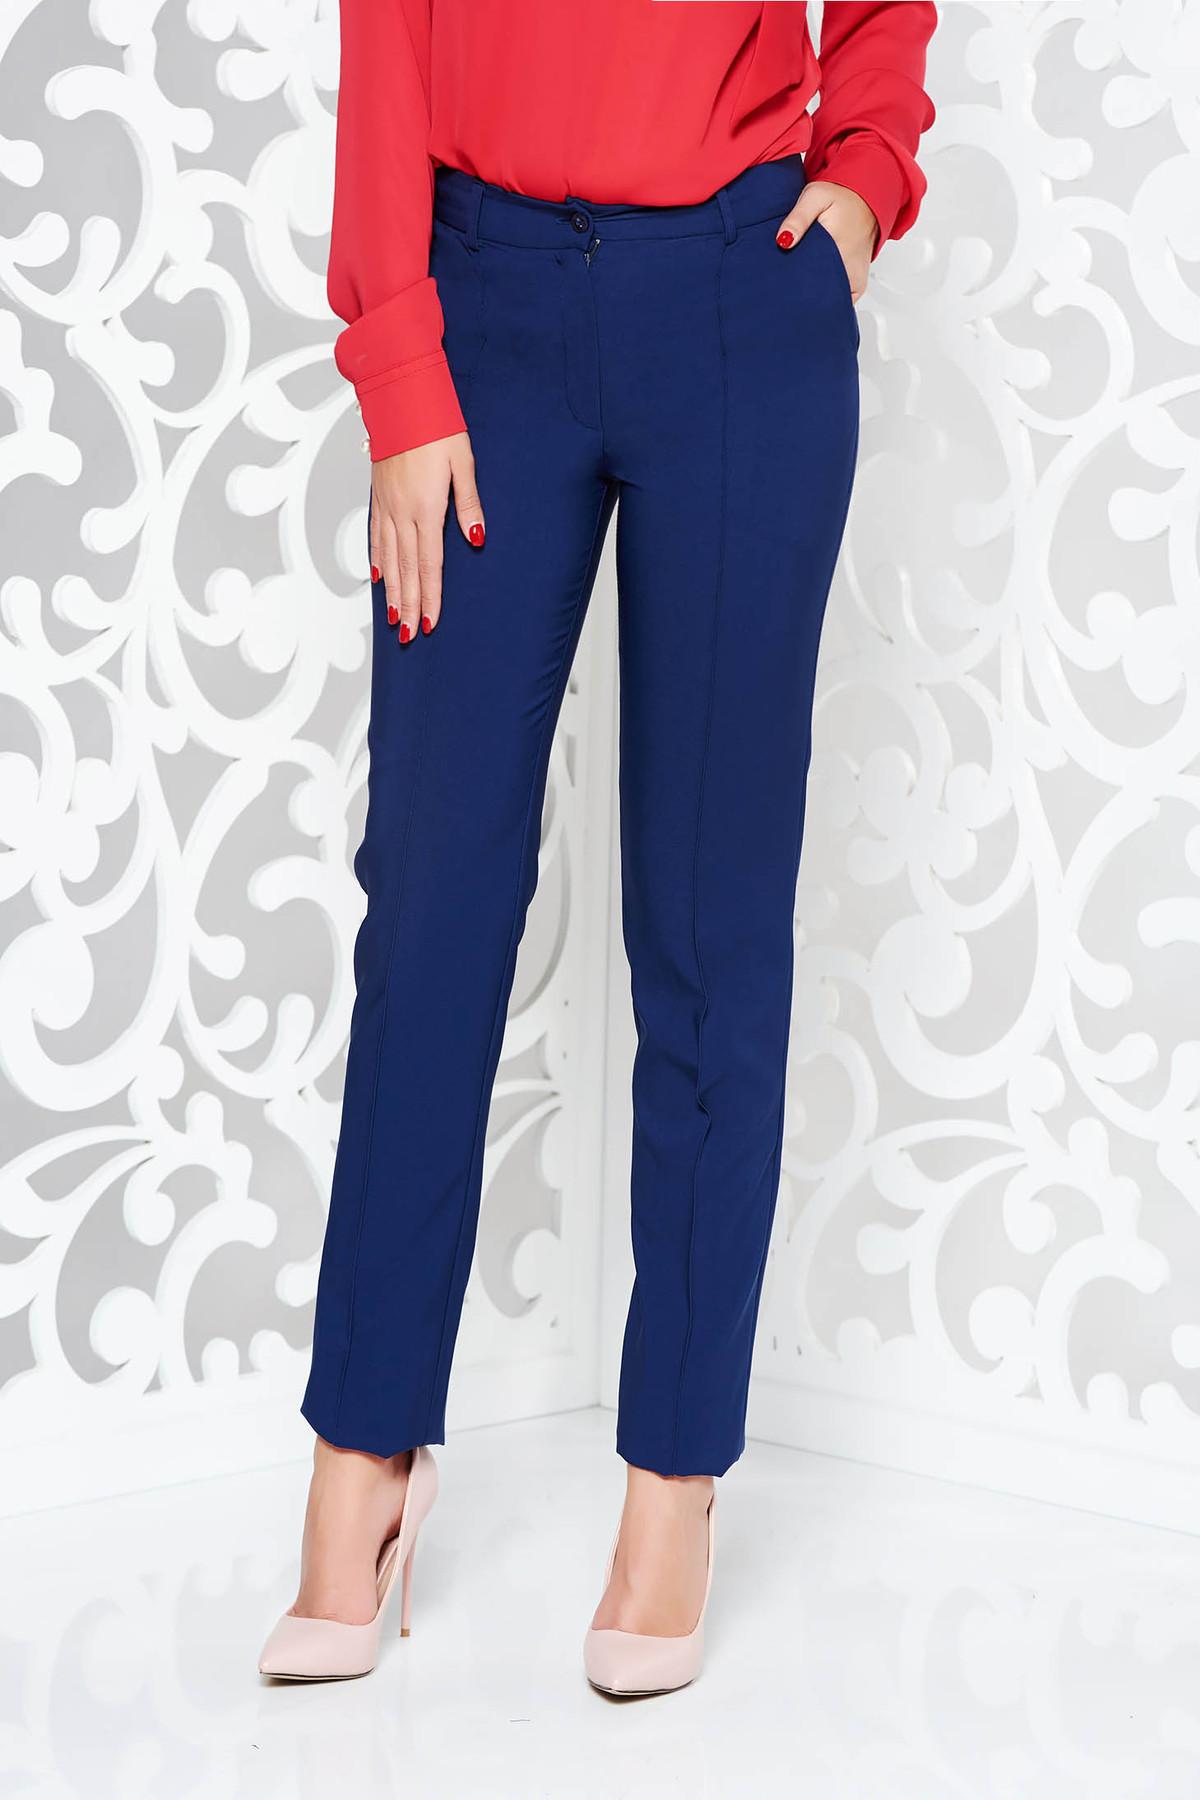 Pantaloni LaDonna albastri-inchis office conici din stofa usor elastica cu talie medie si buzunare